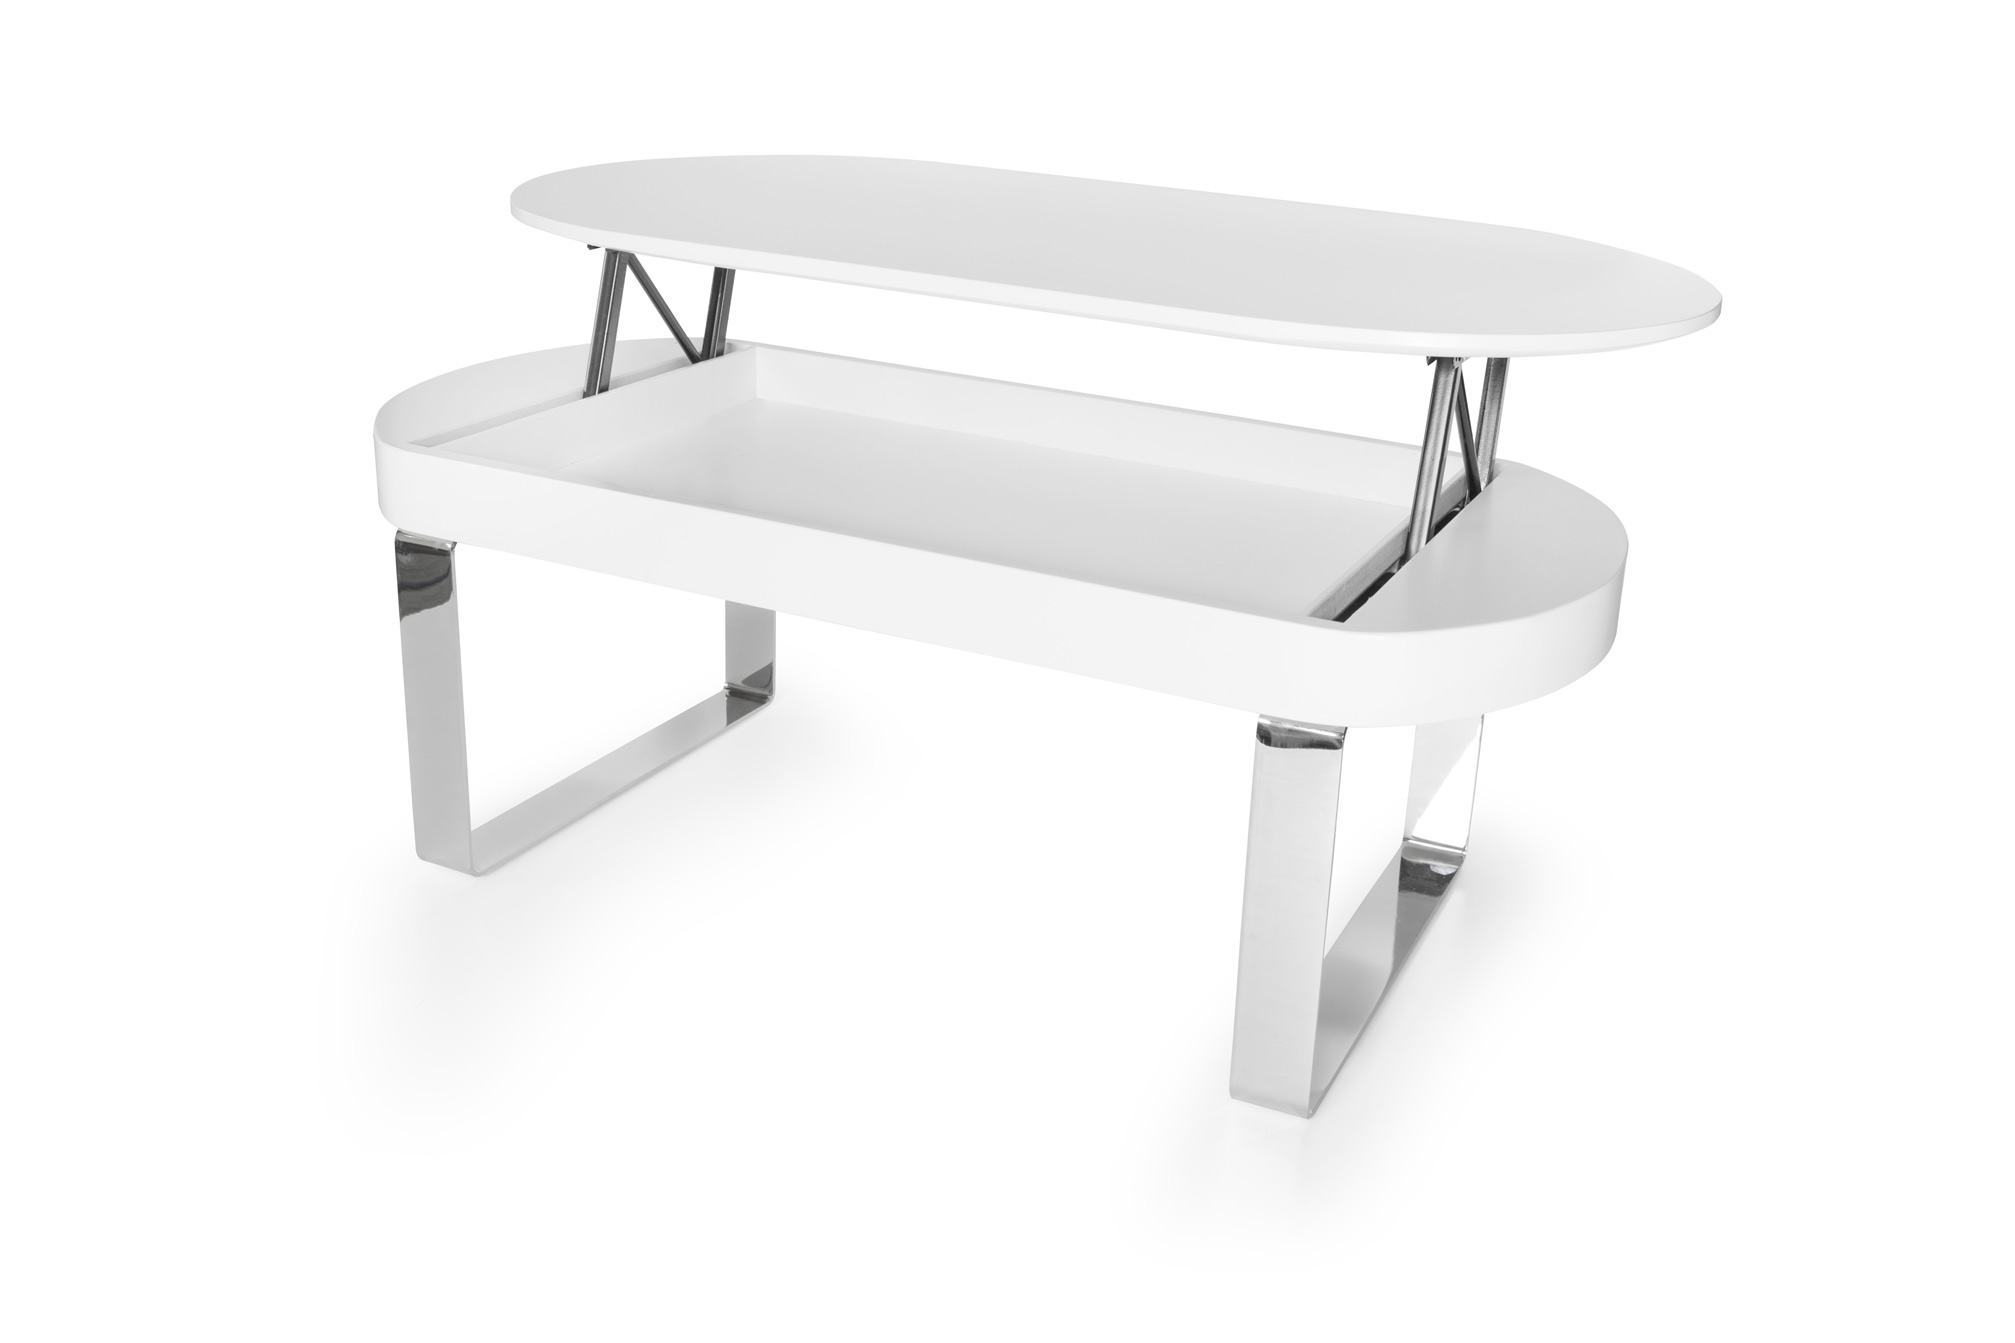 Mesa centro ovalada blanca elevable la mesa de centro for Mesas de salon blancas